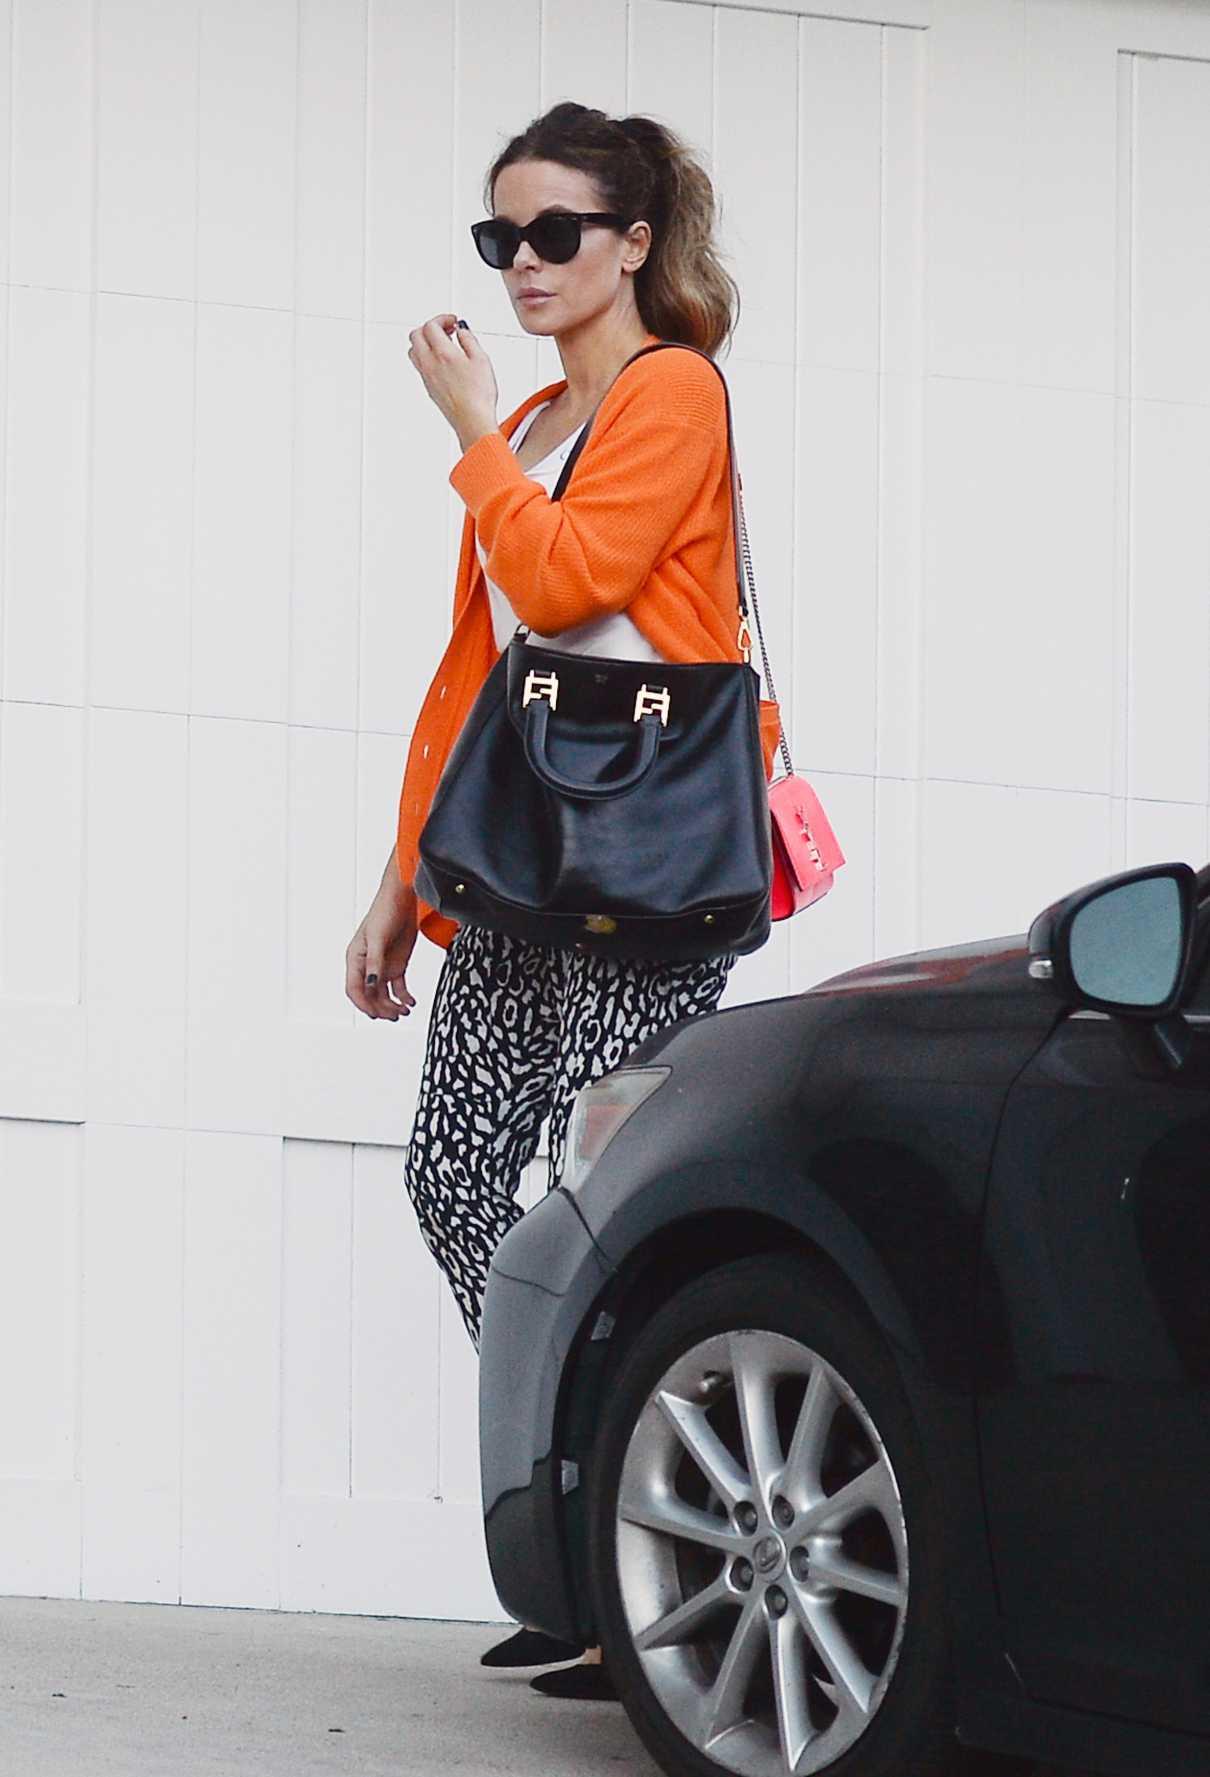 Kate Beckinsale in an Orange Cardigan